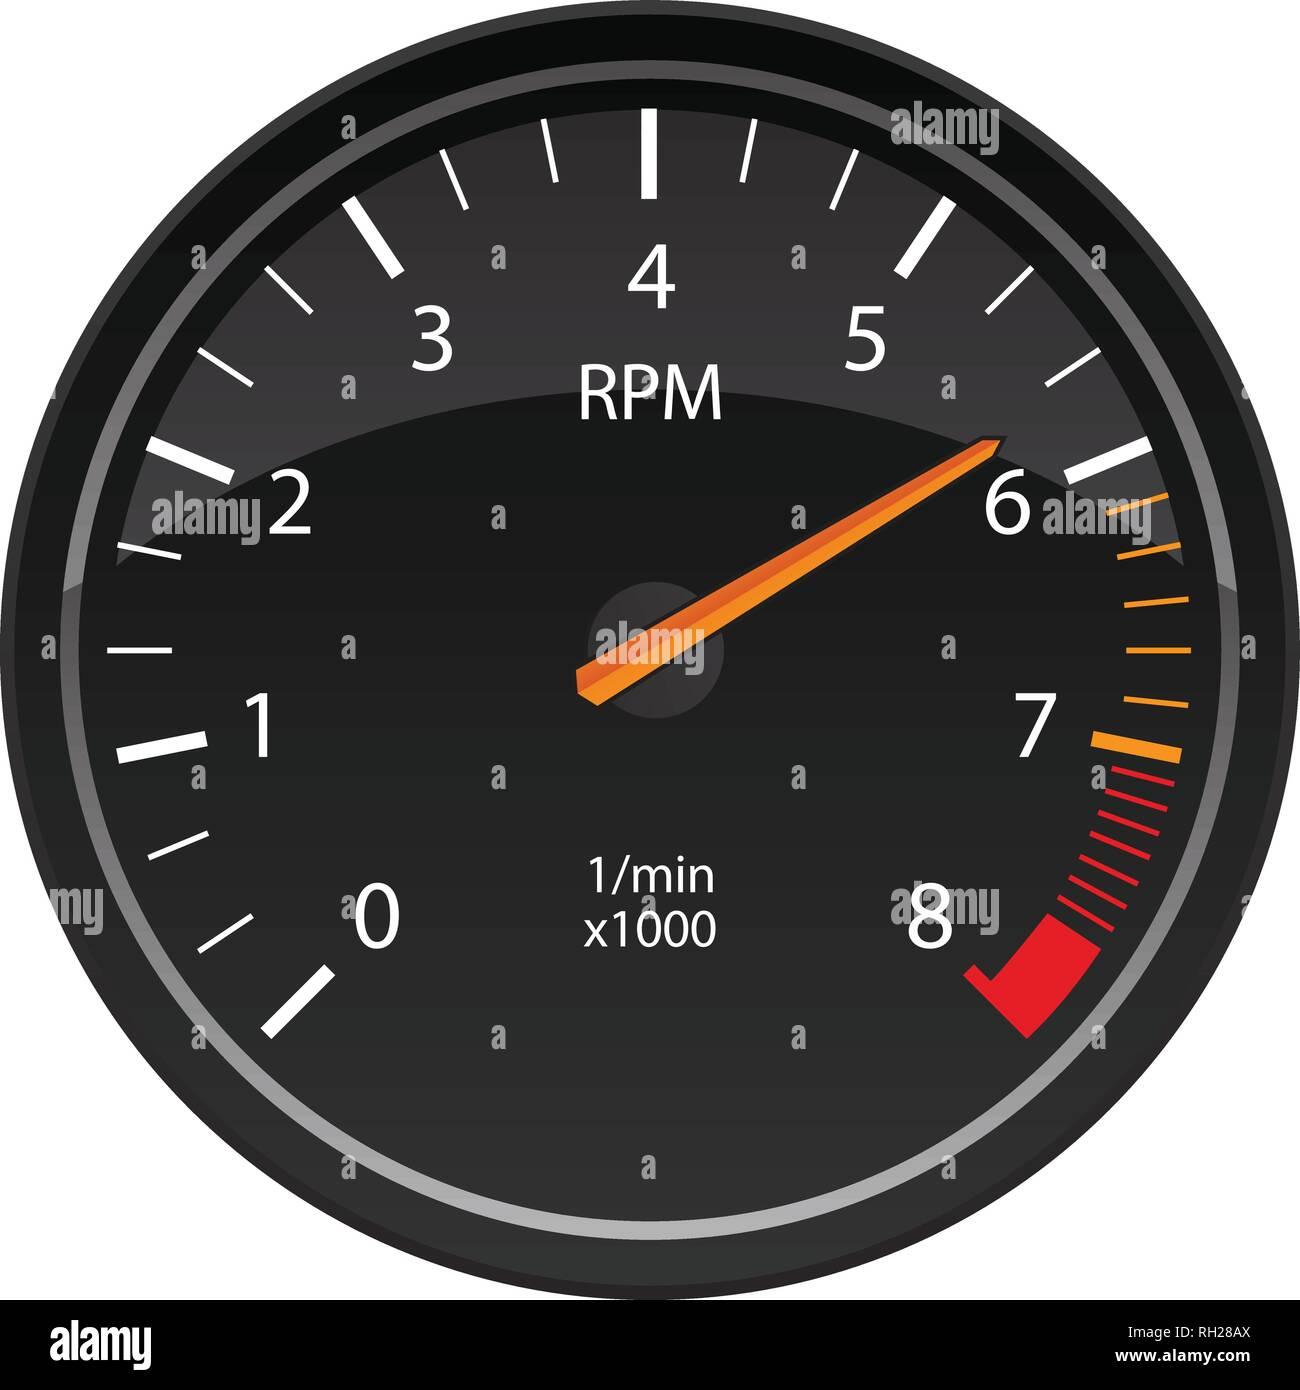 RPM Tachometer Automotive Dashboard Gauge Vector Illustration - Stock Image